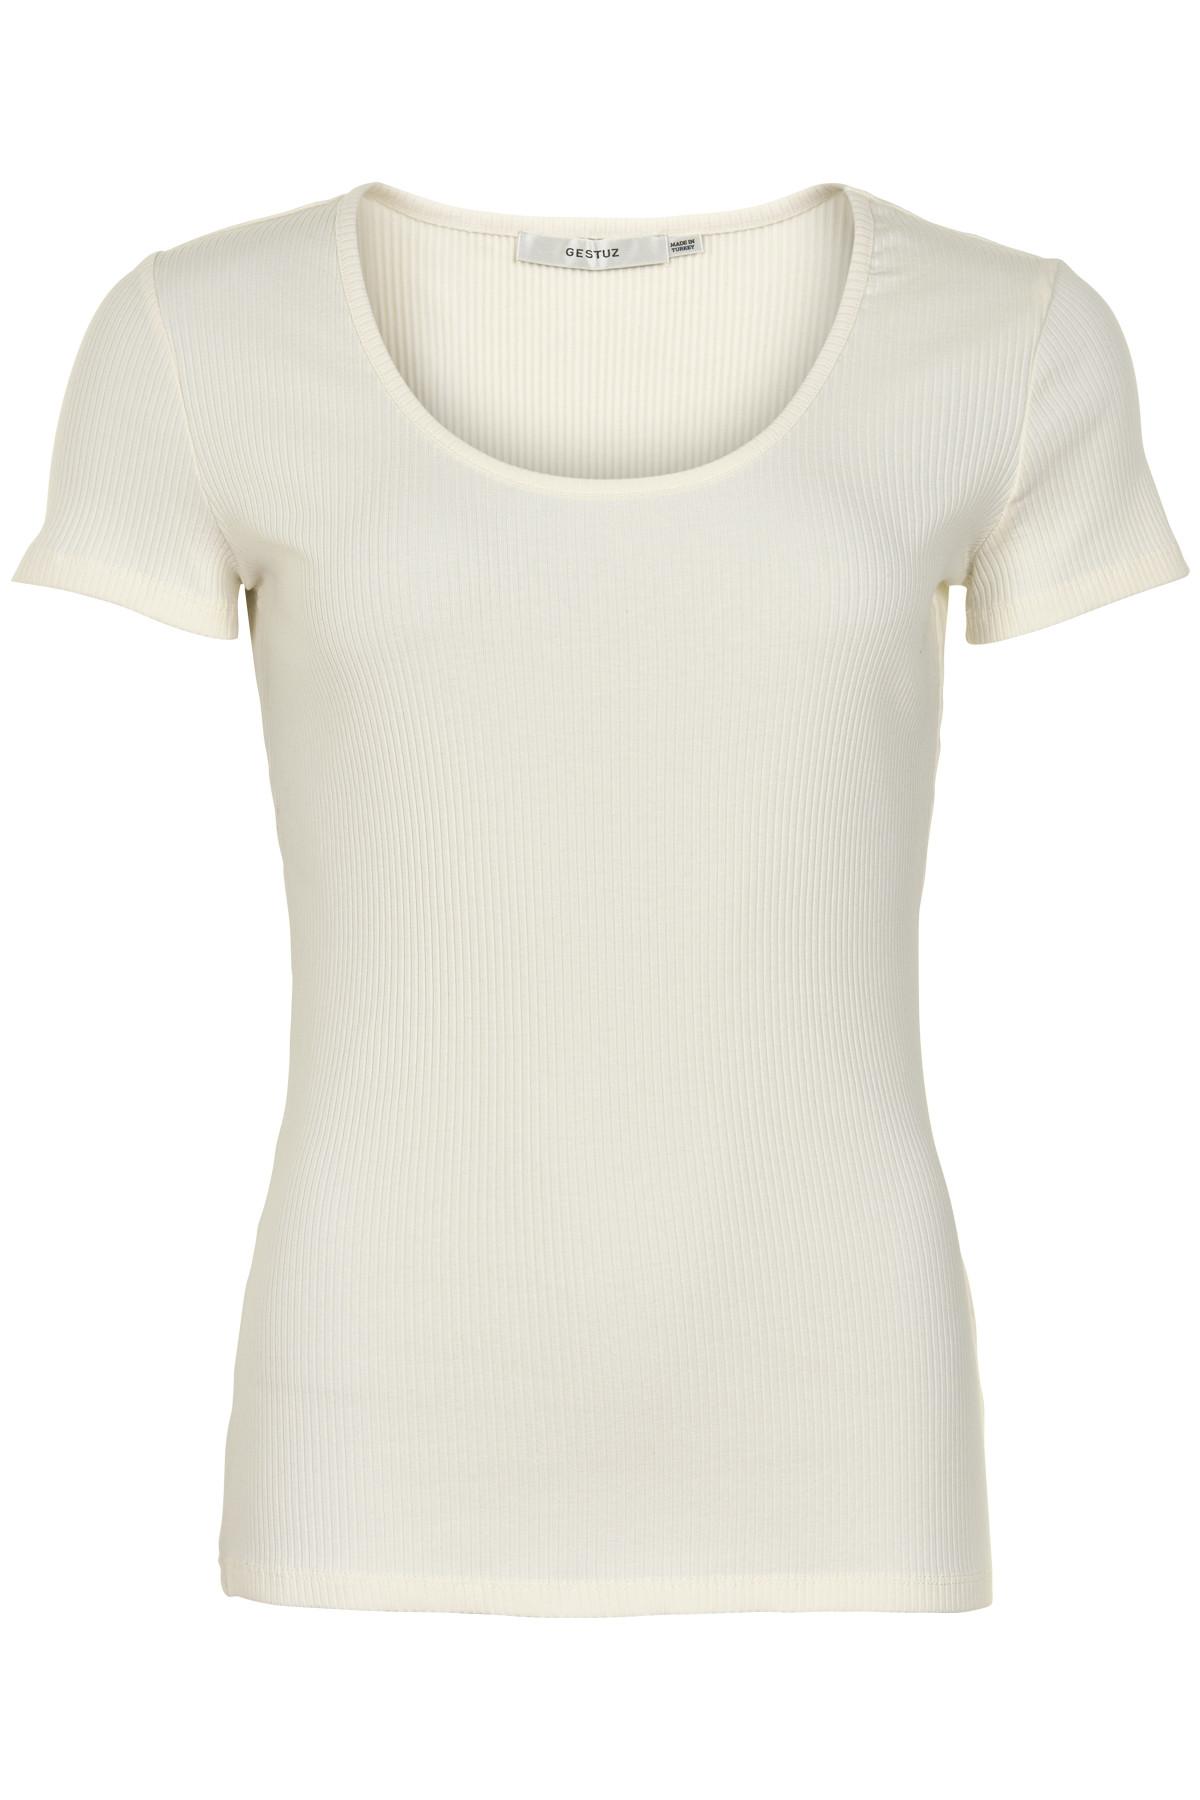 Image of   GESTUZ ROLLA TEE B (Bright White 90014, XS)